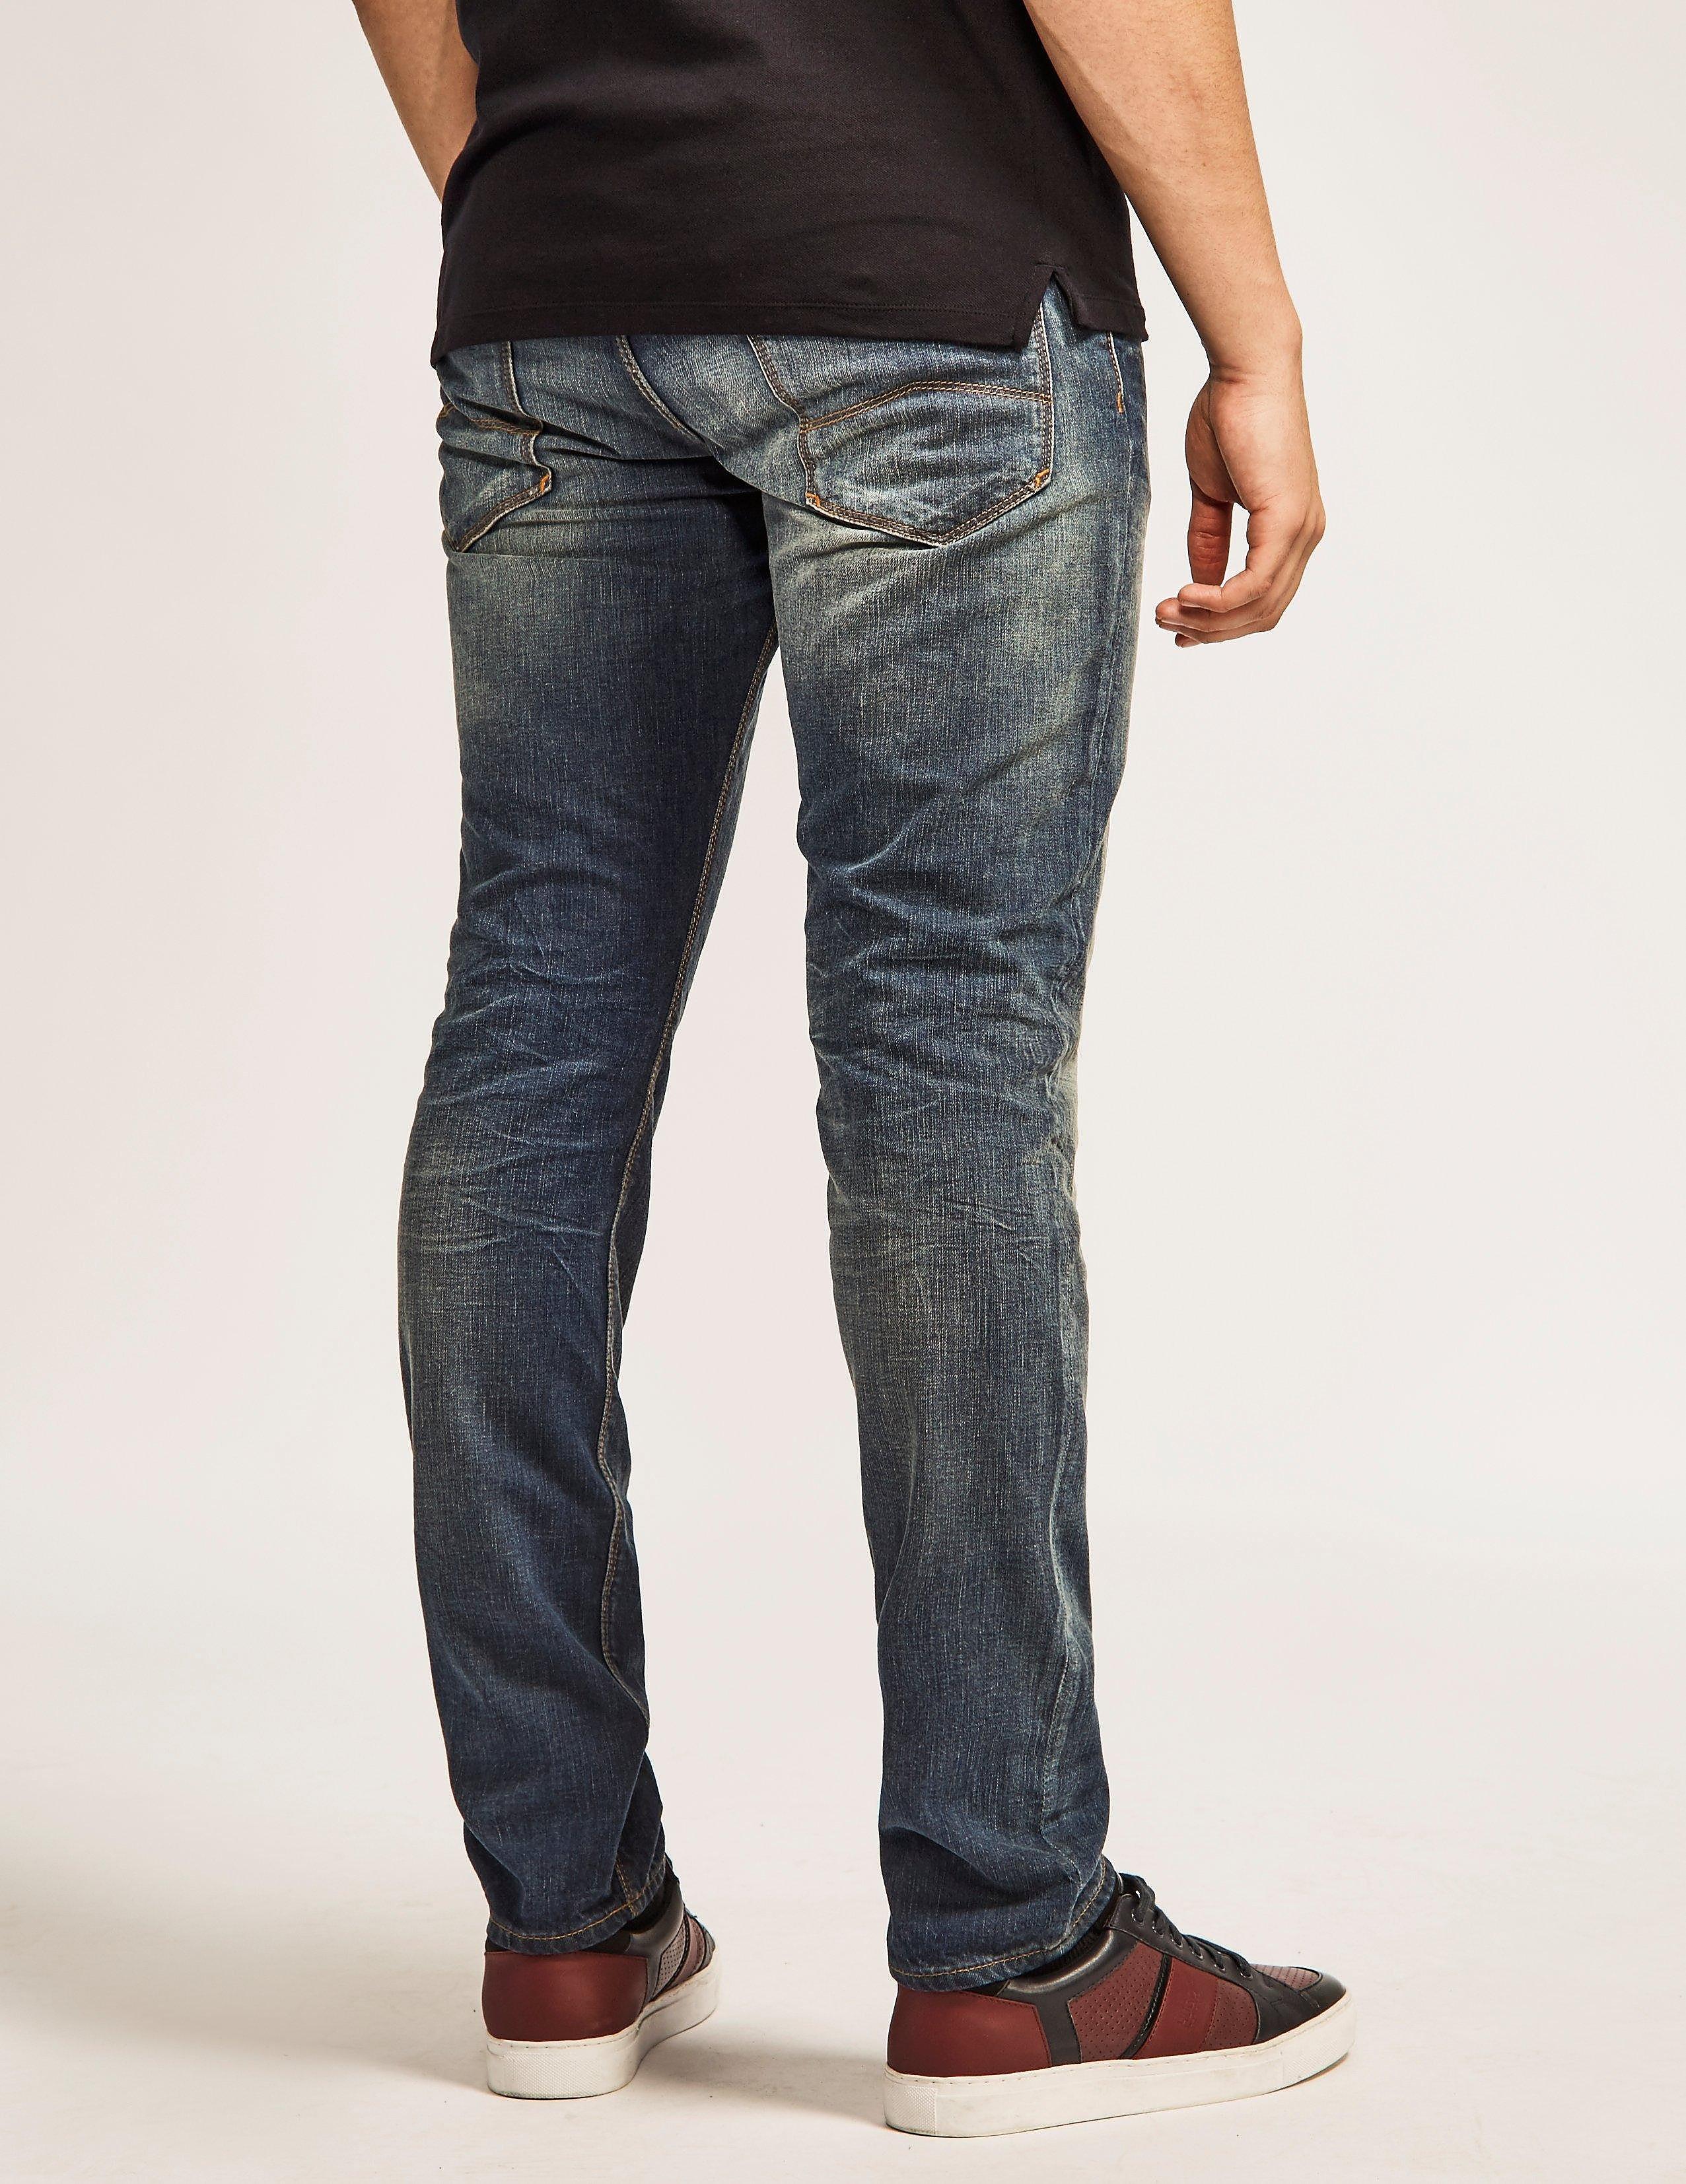 Armani Jeans J06 Rip Repr Jeans